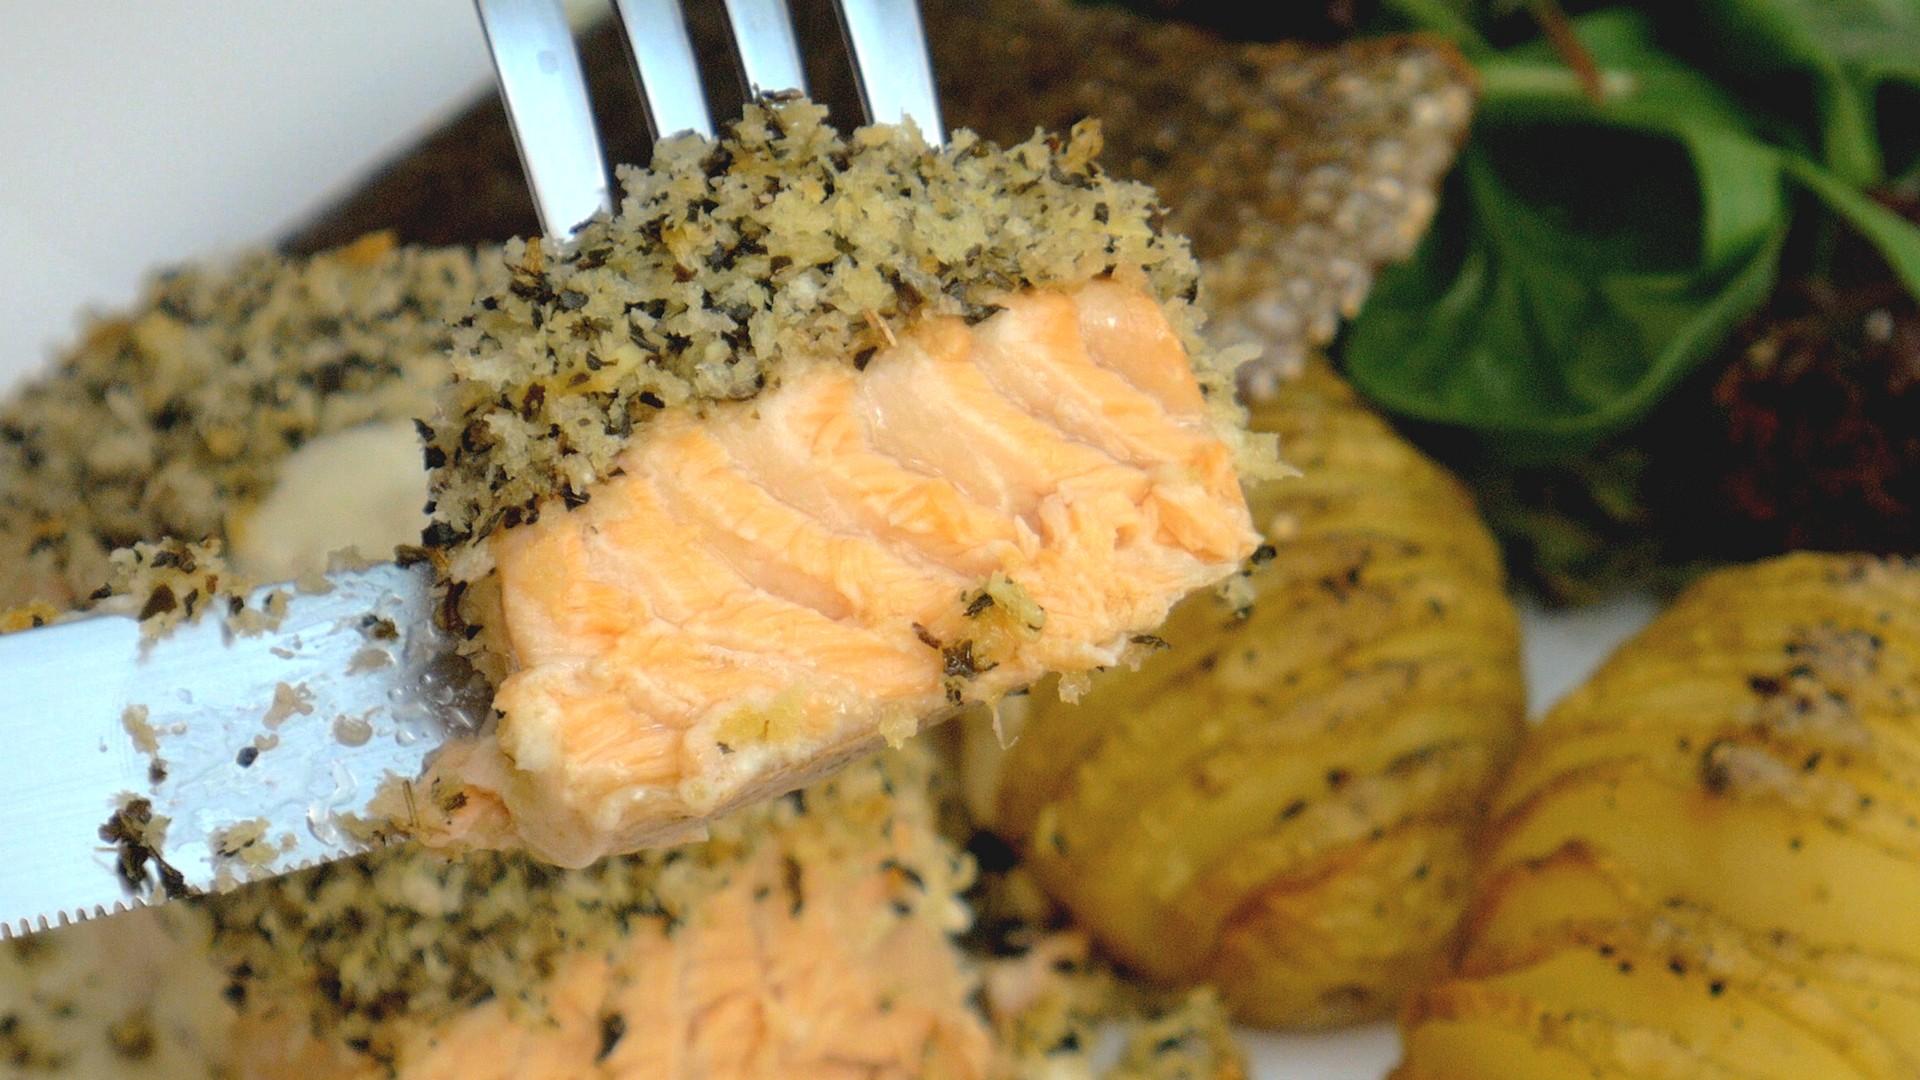 S1E3 Herbs Crusted Salmon Take 6